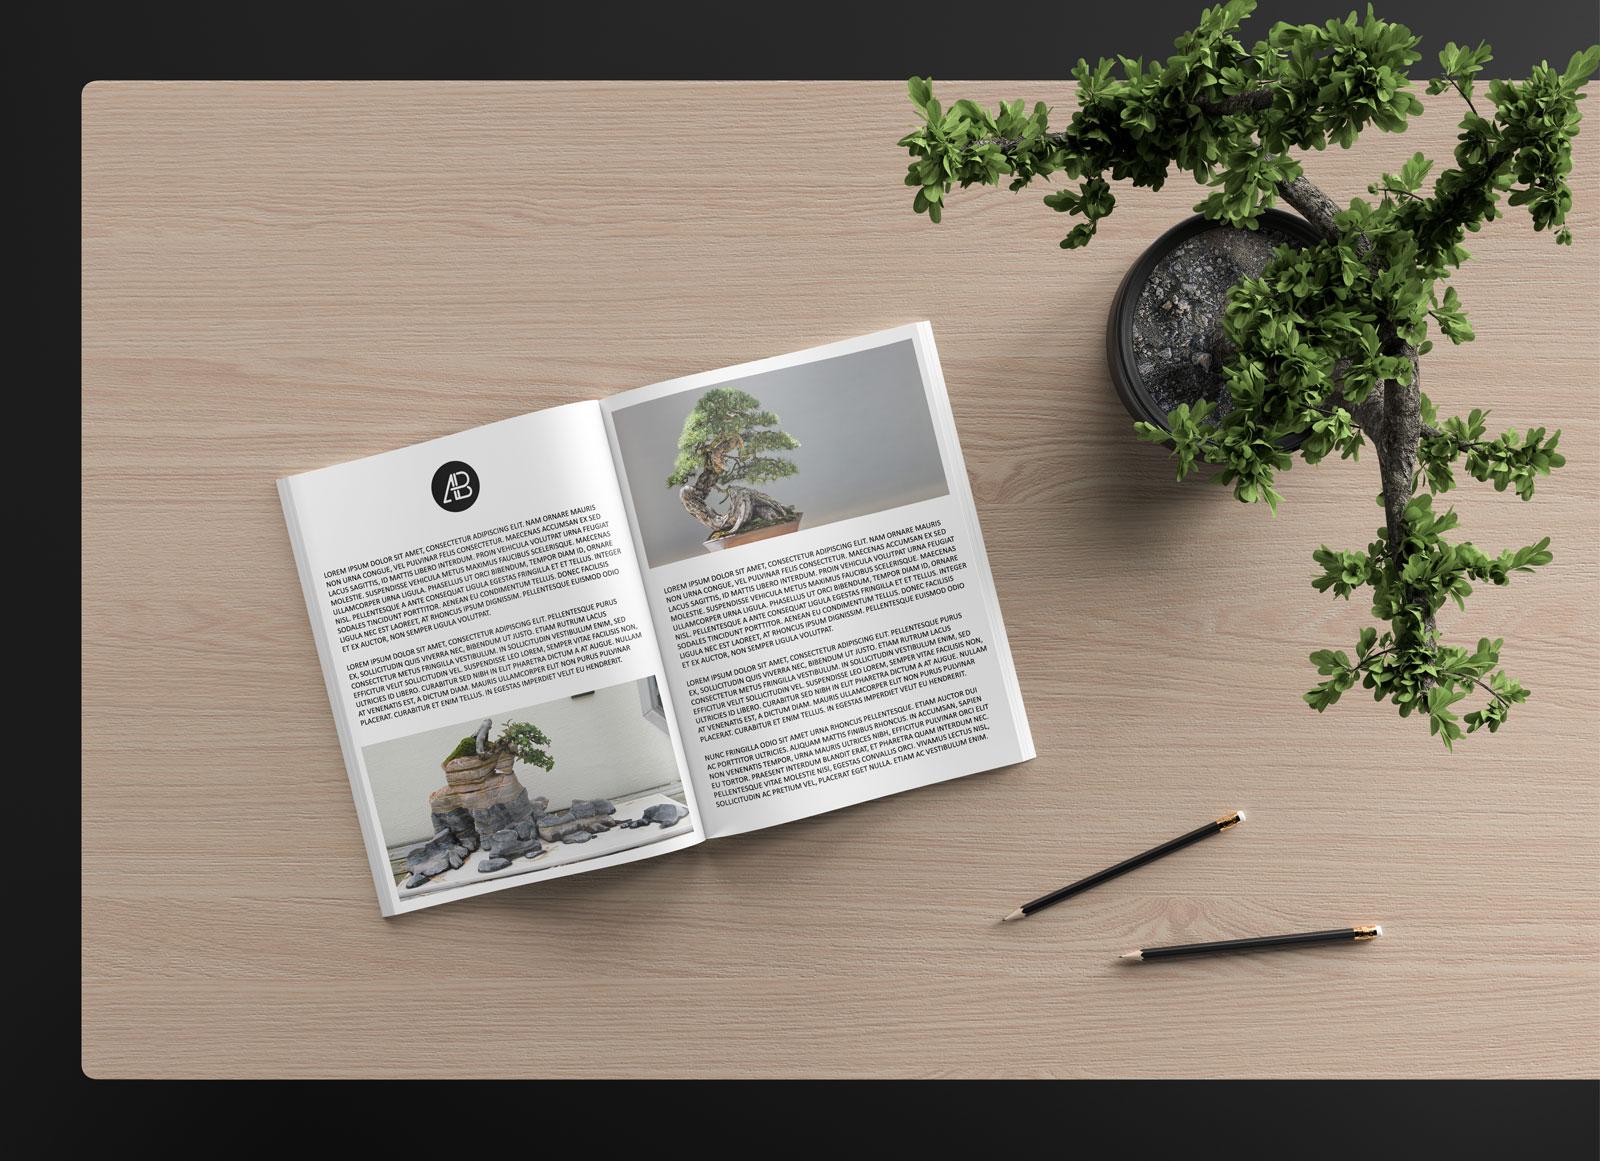 Free-Opened-Book-Mockup-PSD